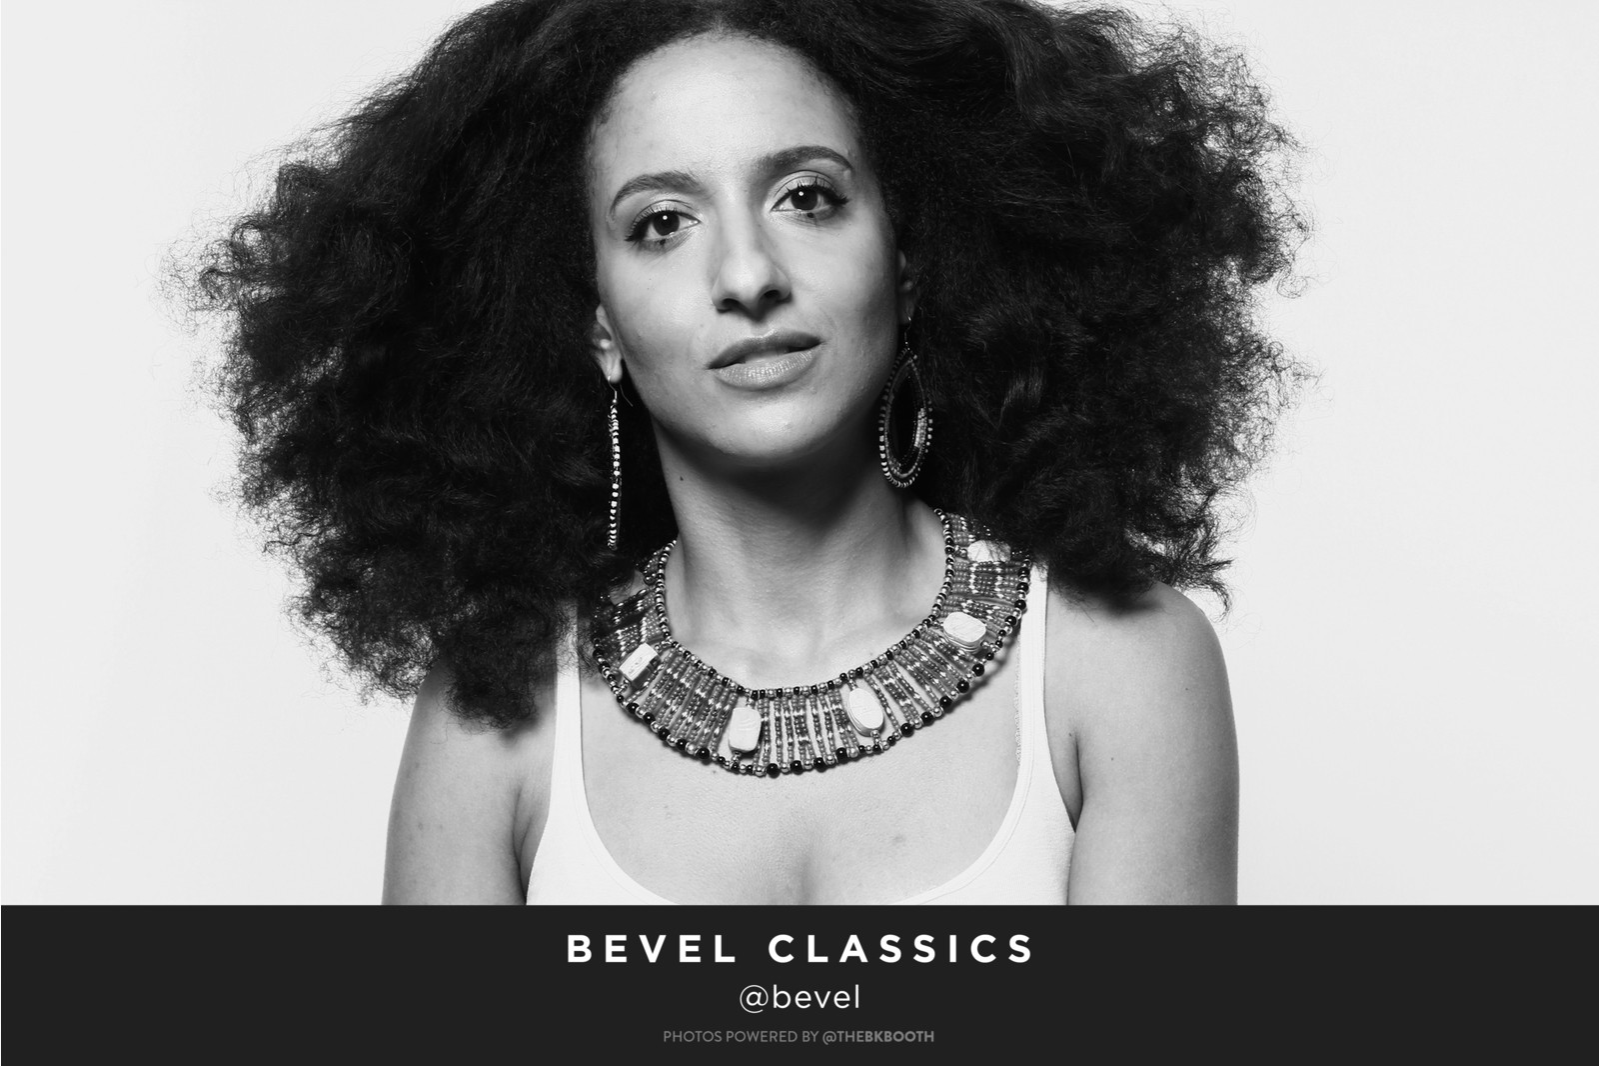 Bevel Classics